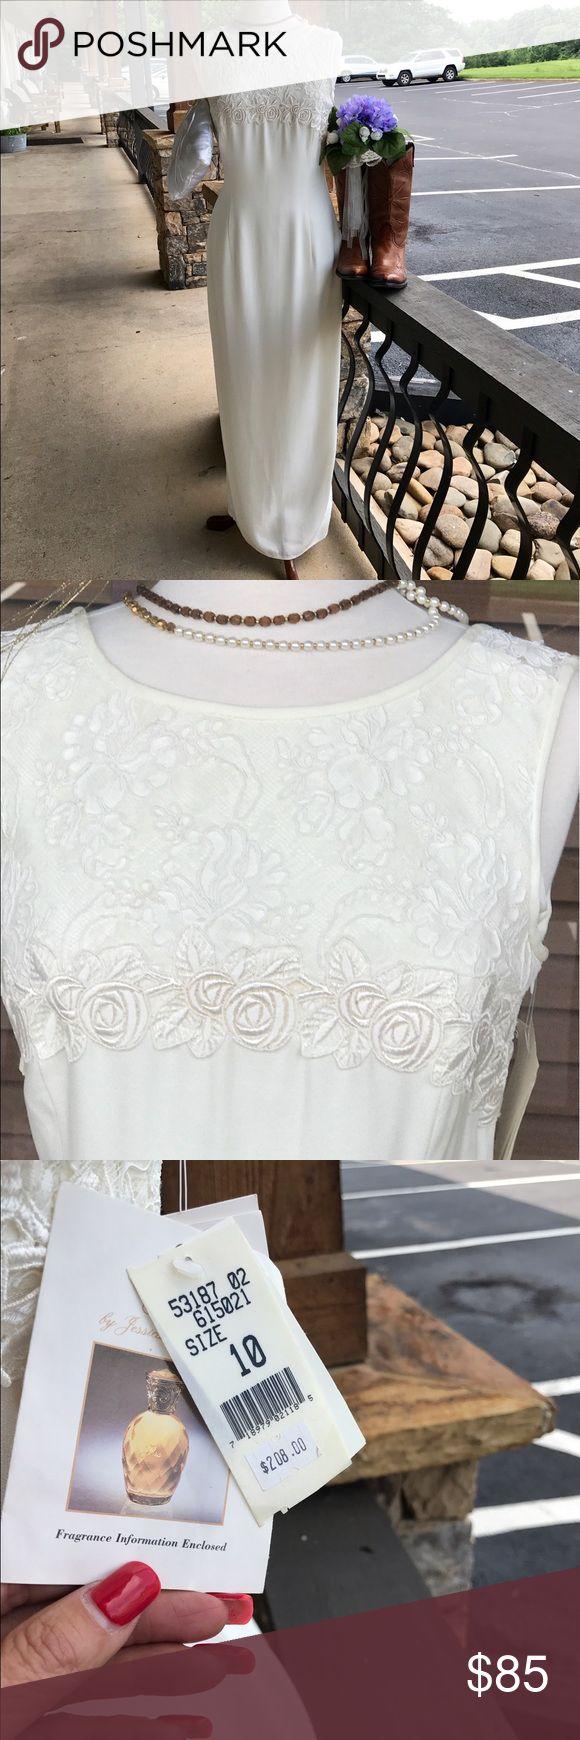 Wedding Dress Beautiful Ivory Wedding Dress new with tags Jessica McClintock Dresses Wedding